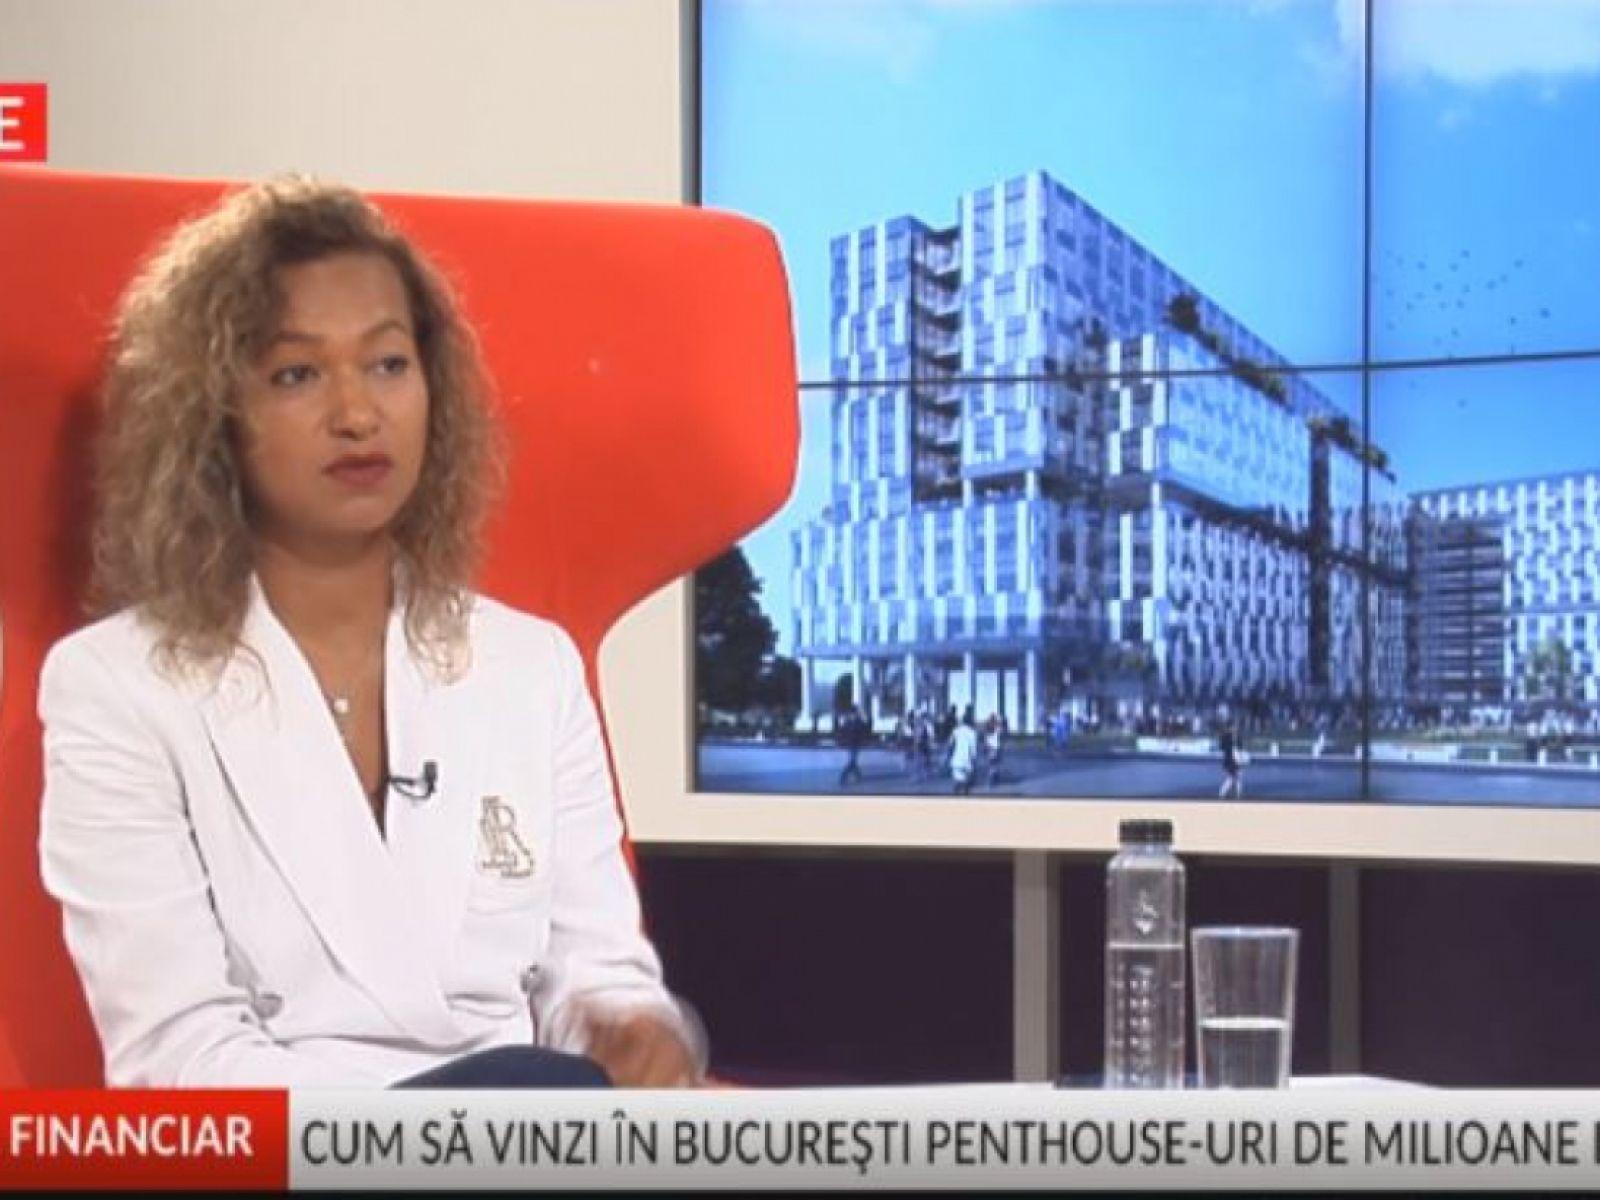 Beatrice Dumitrașcu, VP Residential Sales One United Properties live at Adevărul Financiar